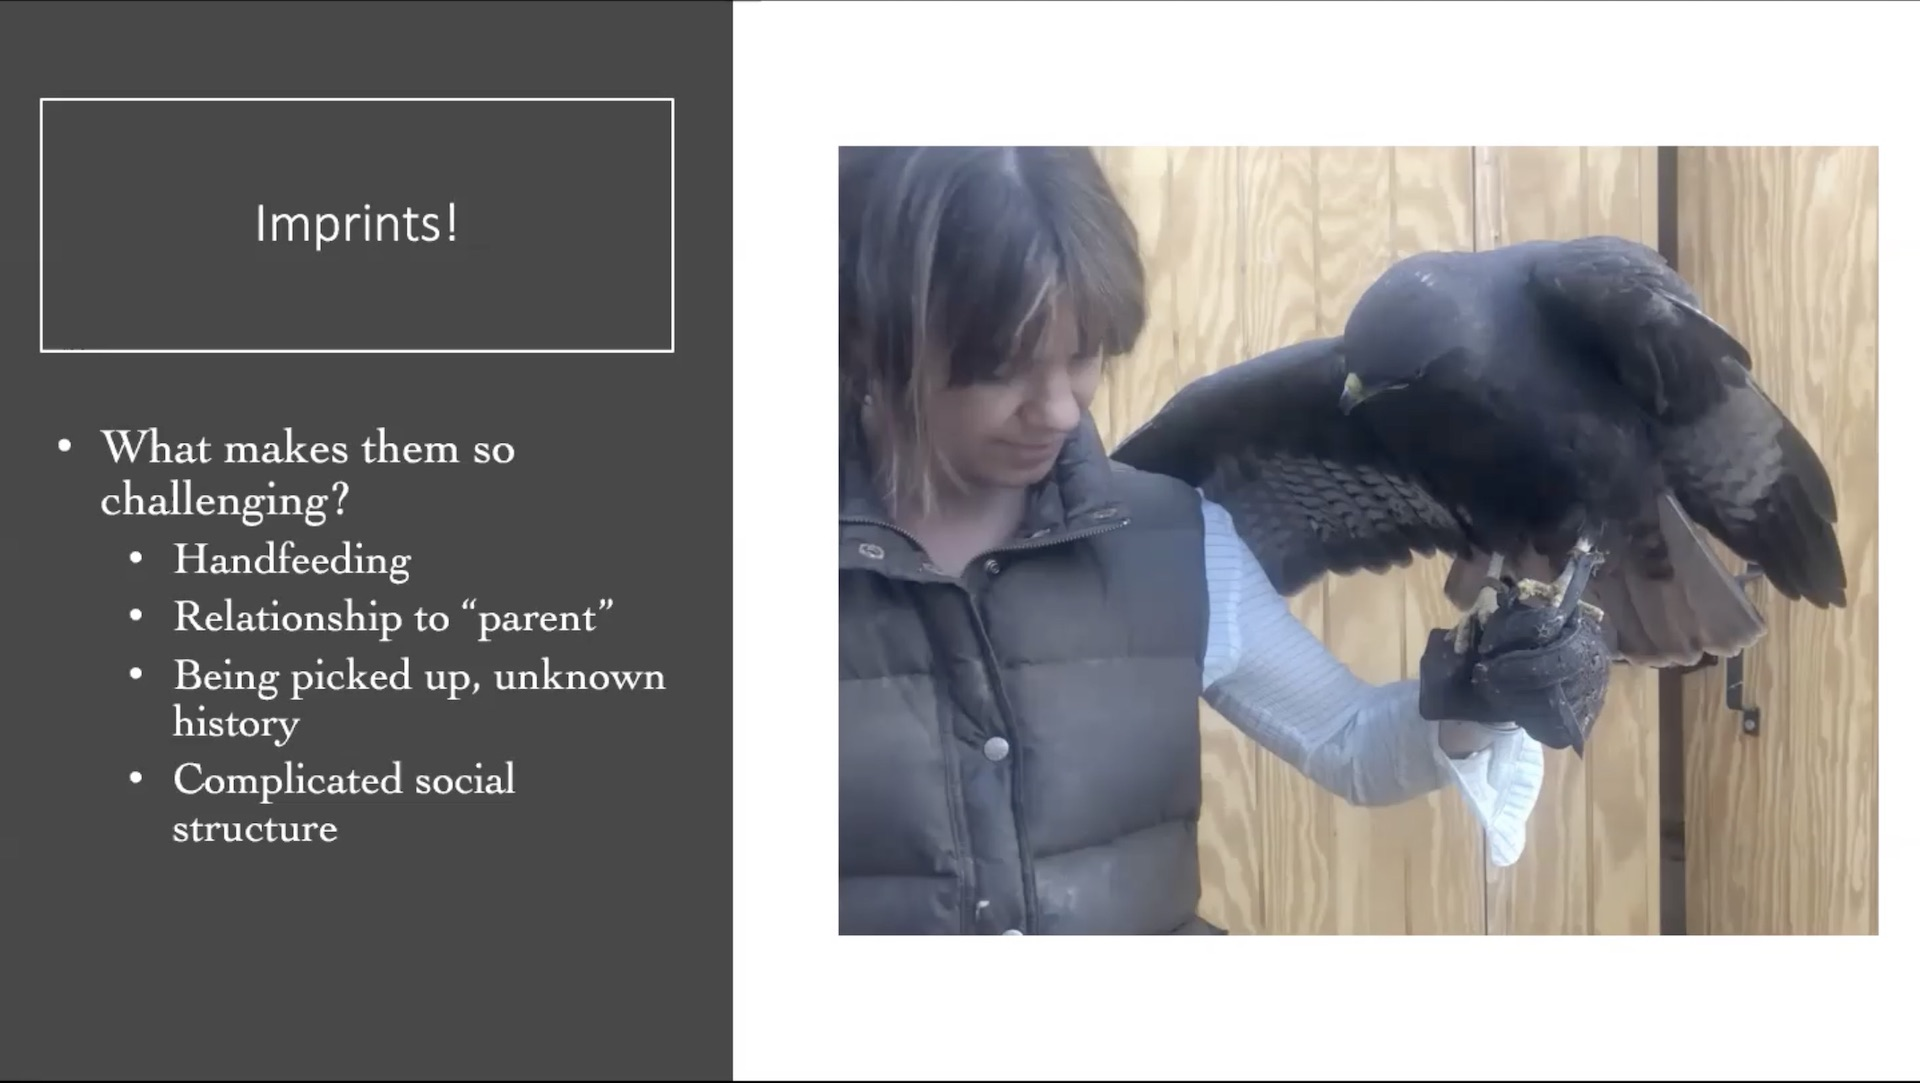 webinar avian behavior imprints